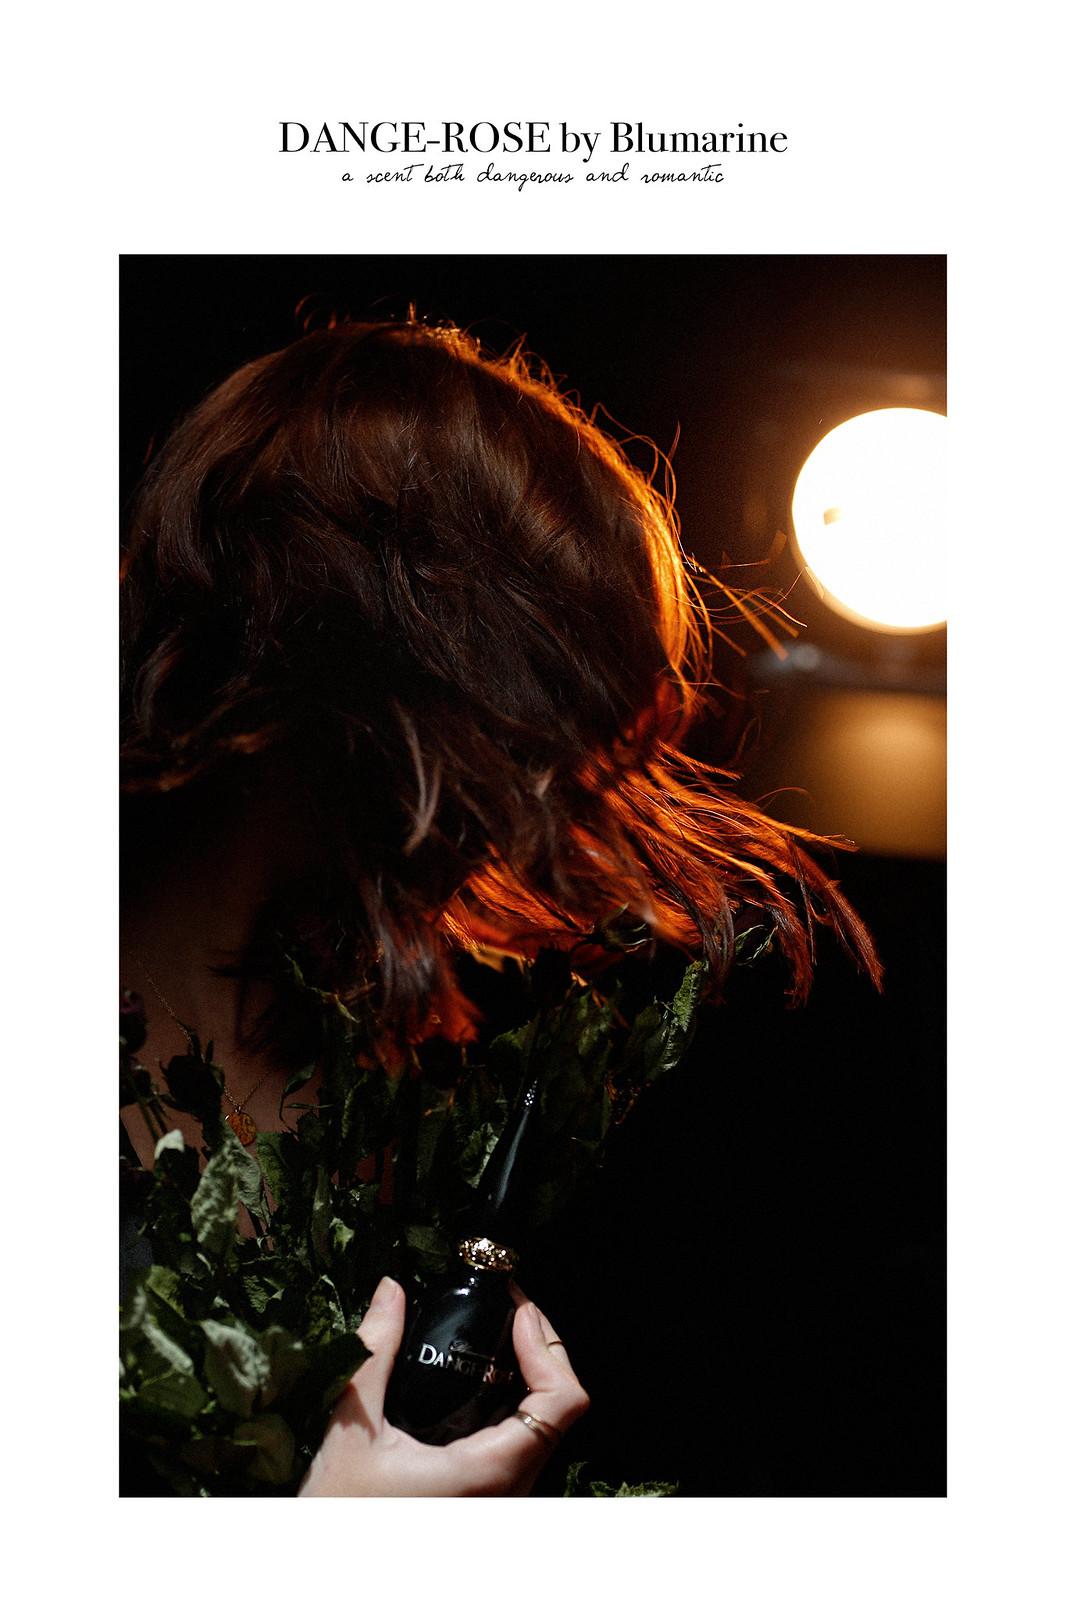 blumarine dange rose parfum perfume scent flaconi shooting light dark darkness roses shooting backlight brunette beauty beautyblogger gothic goth style medieval cats & dogs beautyblog ricarda schernus 3